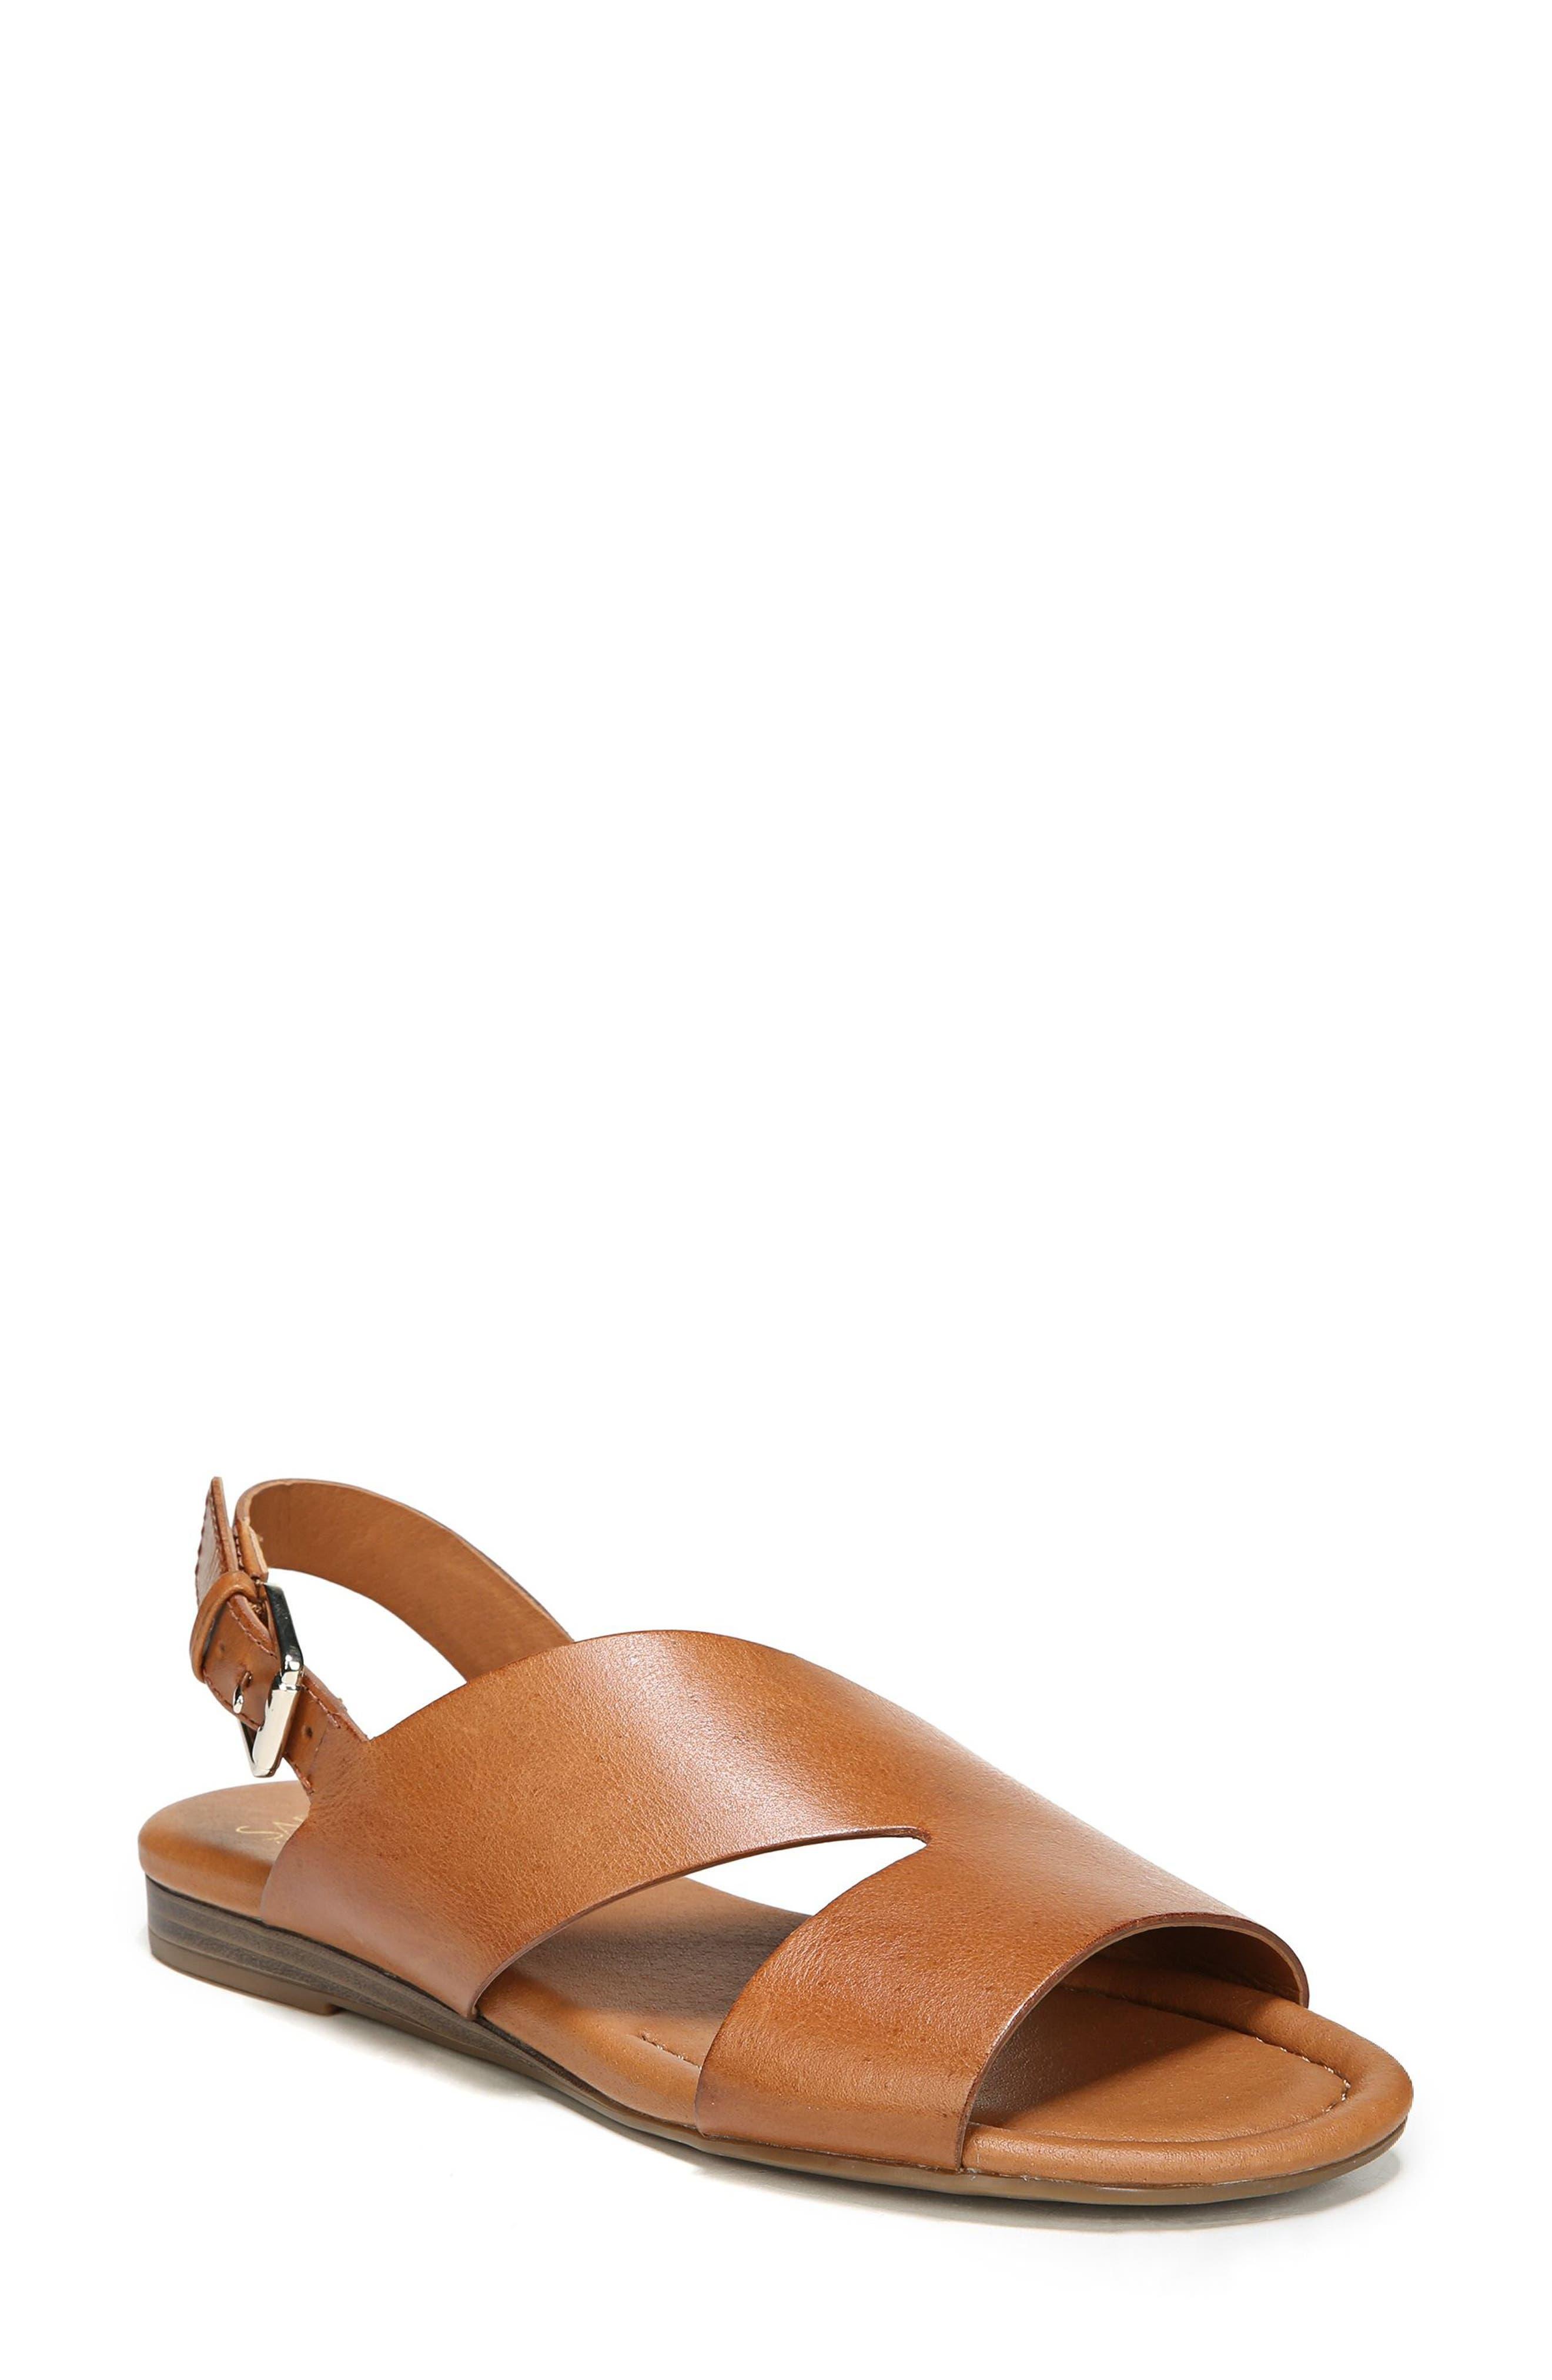 Garza Slingback Sandal,                             Main thumbnail 1, color,                             Tan Leather